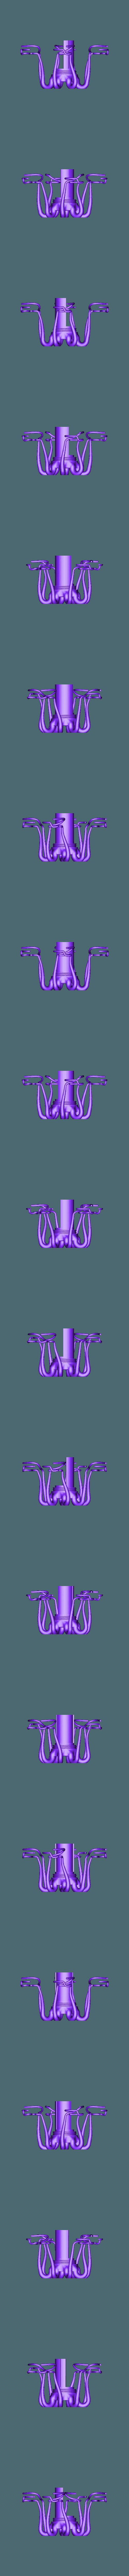 Octopus body.STL Download STL file Candle holder octopus • 3D printer design, Sceadugenga